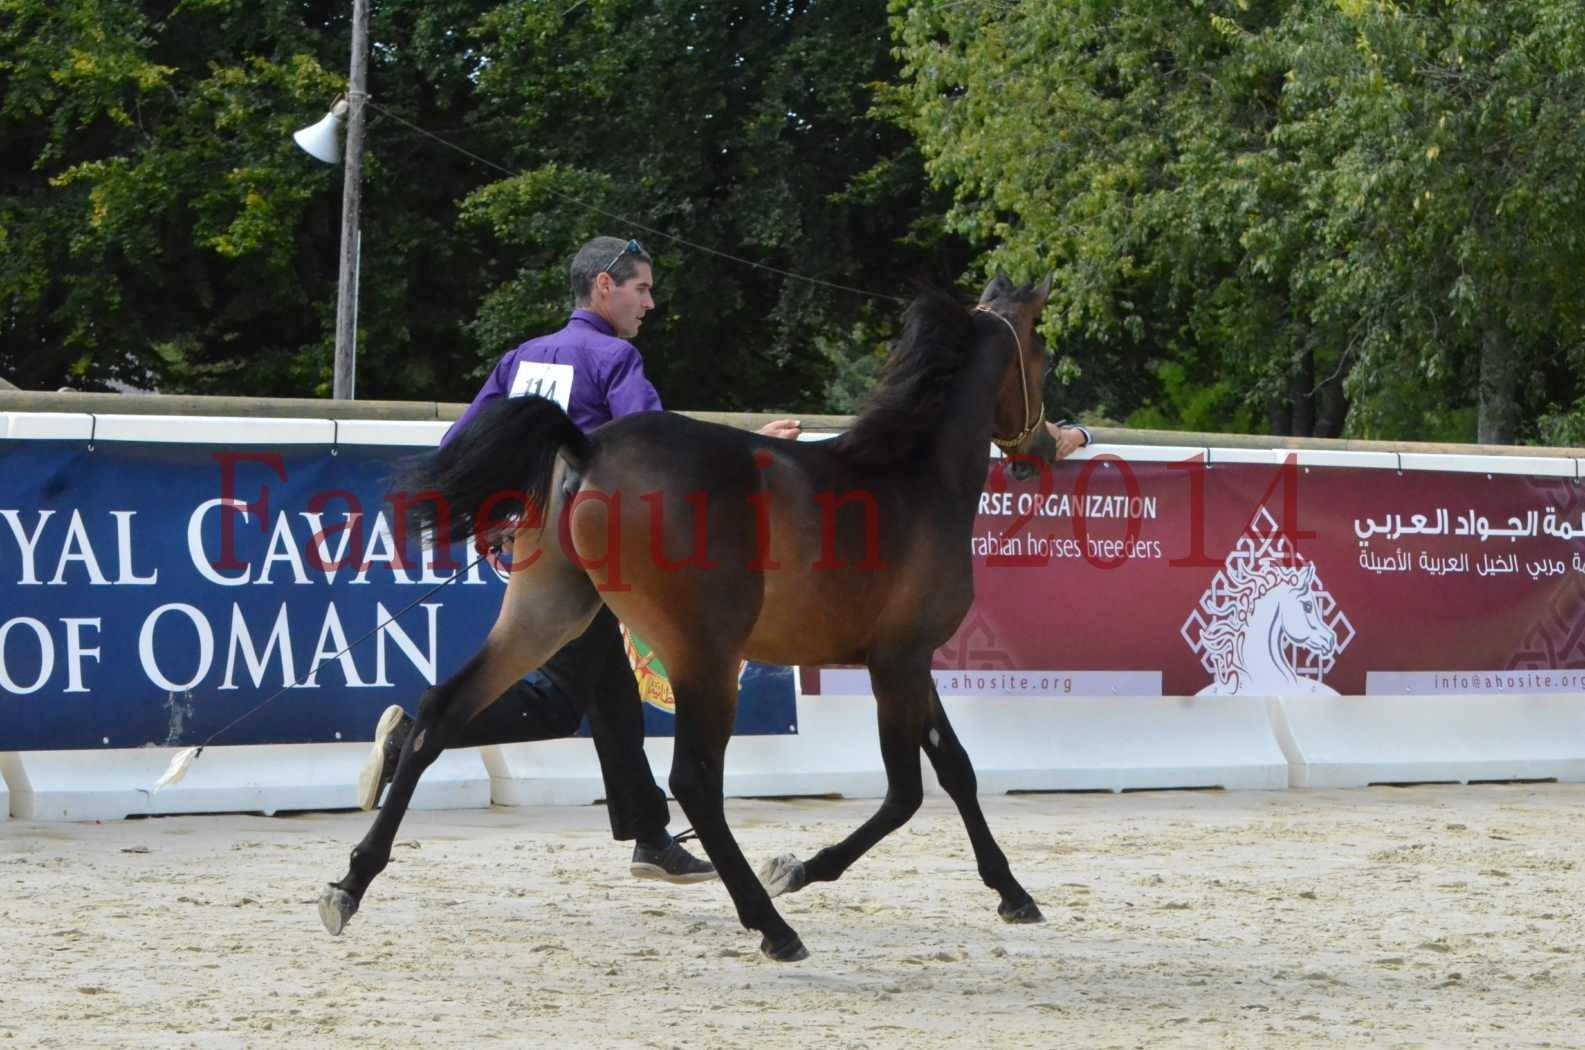 Championnat de FRANCE 2014 - Amateurs - SH FARAJAA - 21